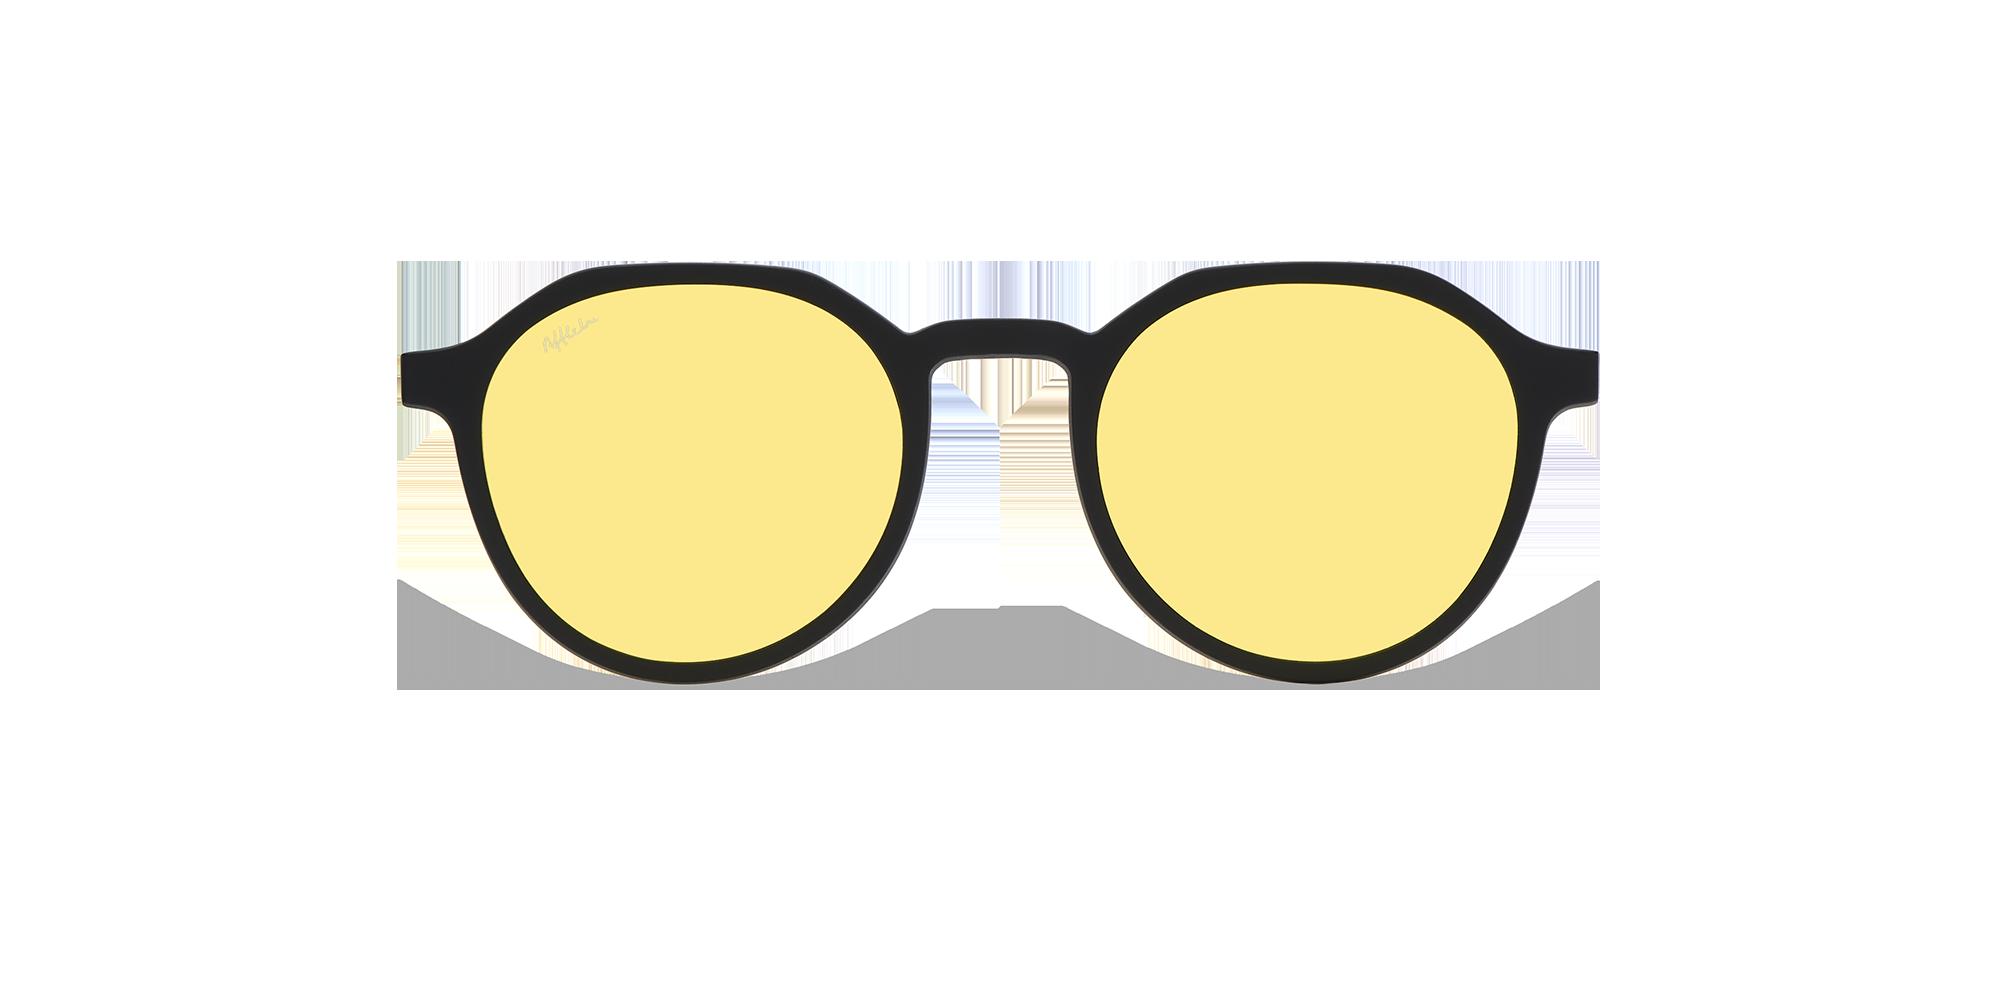 afflelou/france/products/smart_clip/clips_glasses/07630036429020_face.png